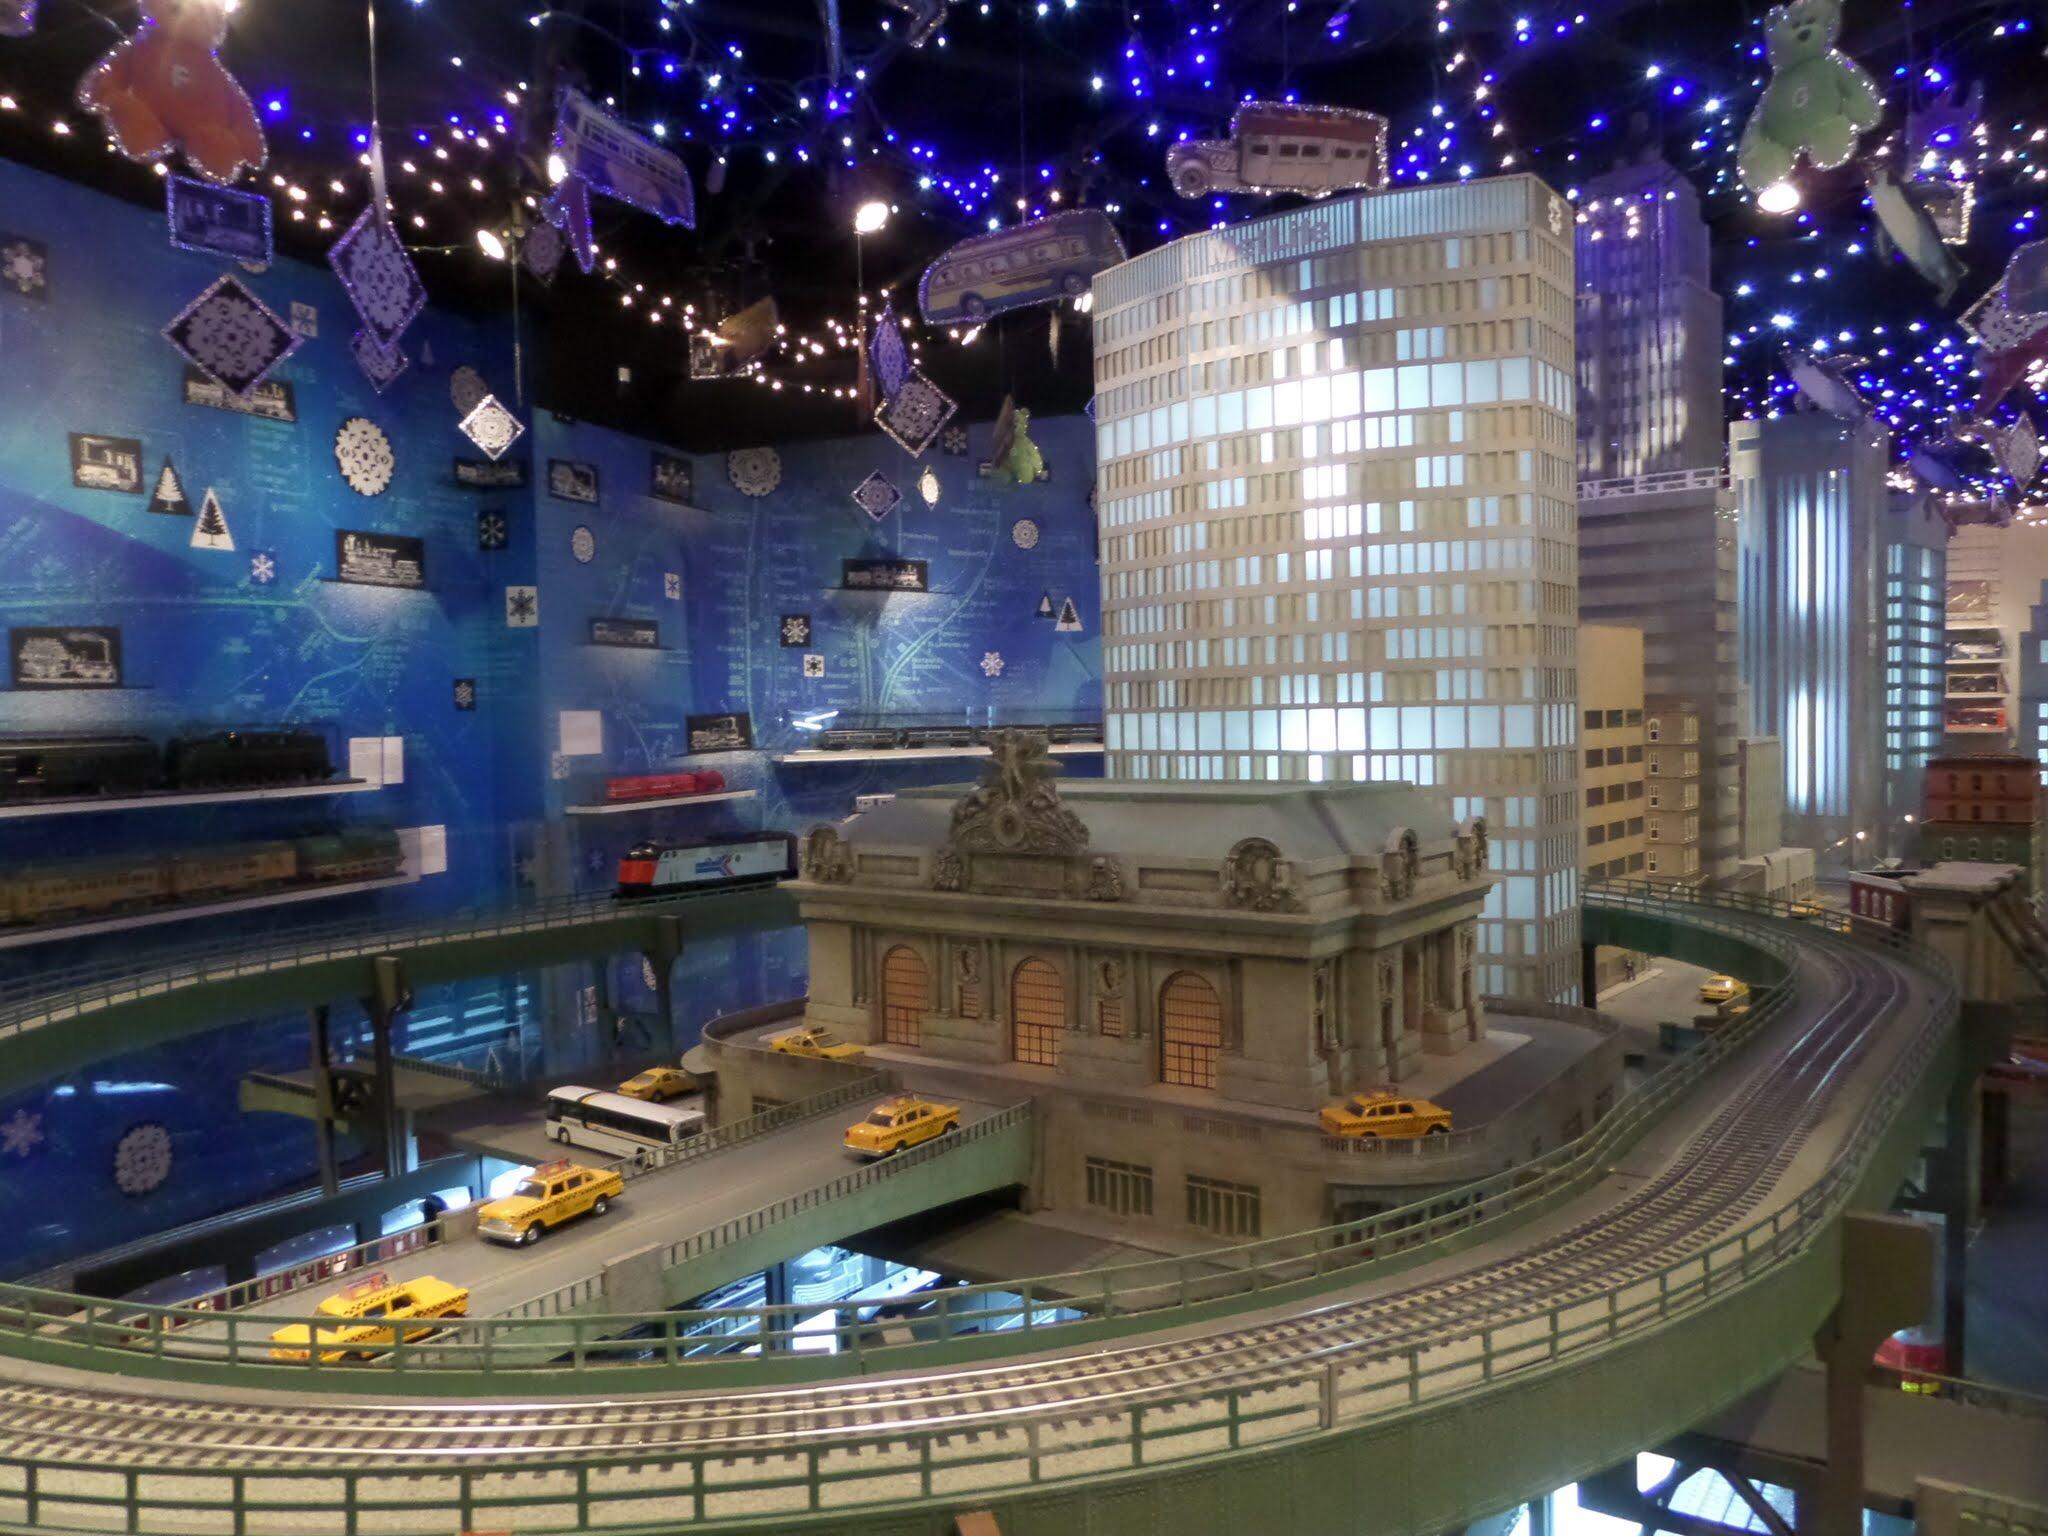 Transit Museum Christmas Model Rail Exhibition New York City